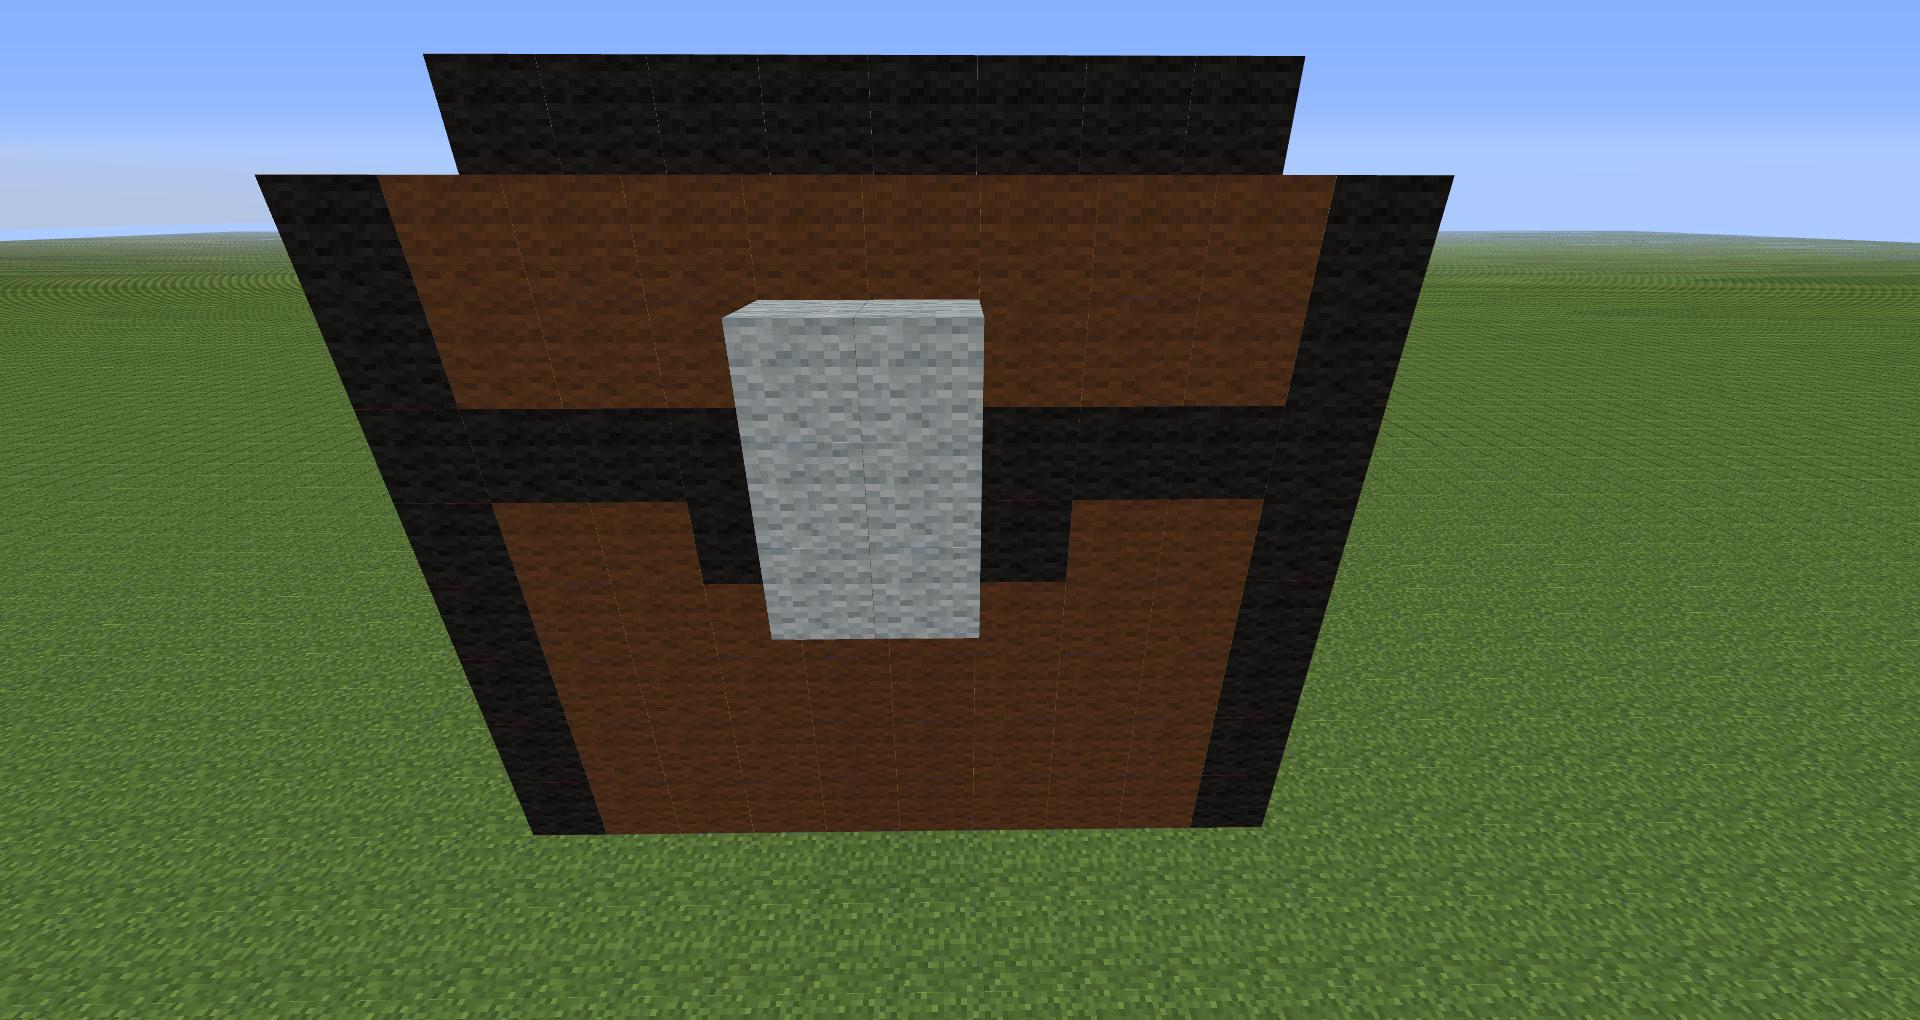 Minecraft chest fail by IamTehDragon on DeviantArt